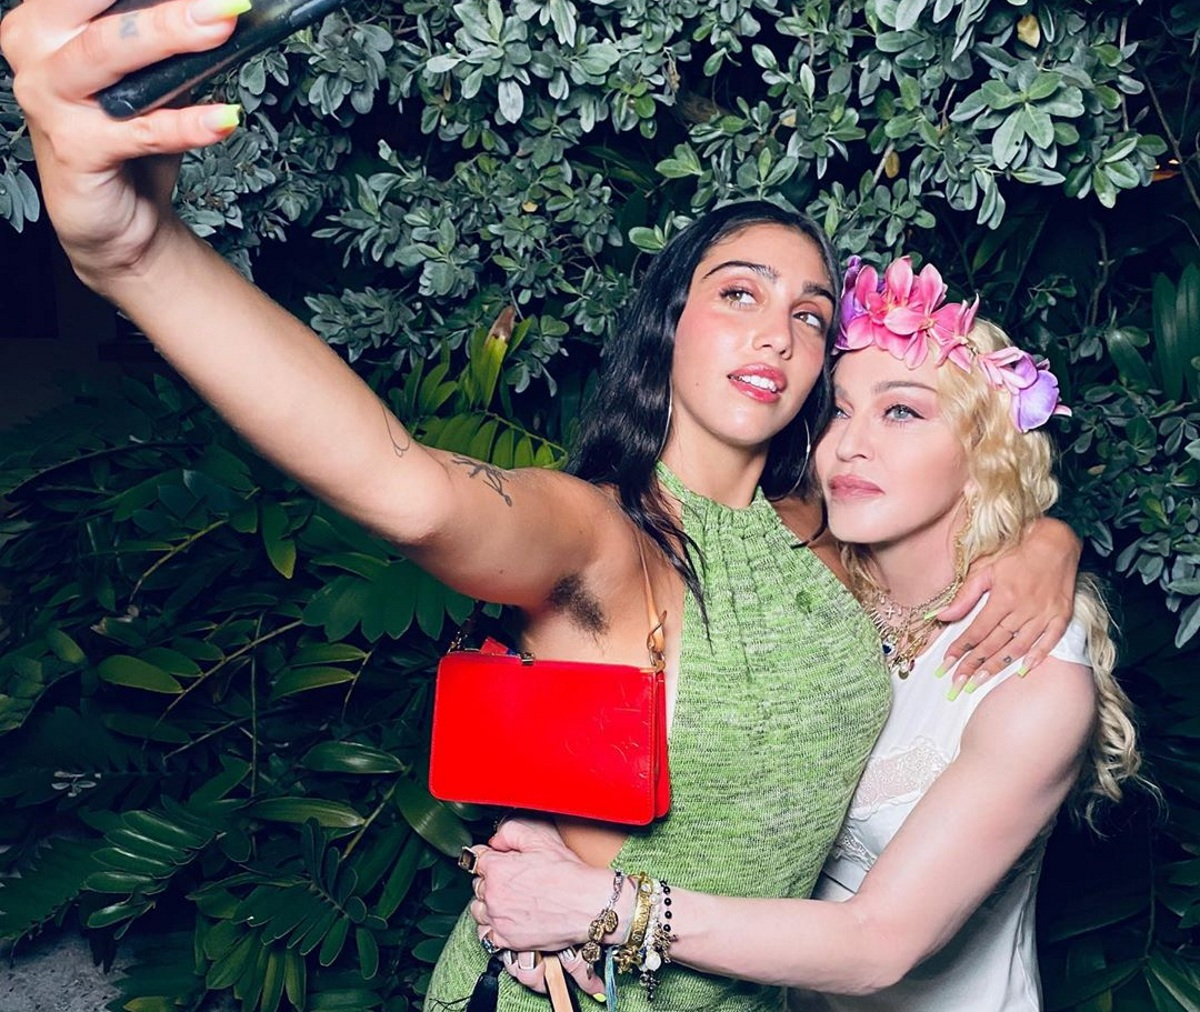 Madonna: Παρατηρείς κάτι ασυνήθιστο σε αυτή τη φωτογραφία με την κόρη της Λούρδη;